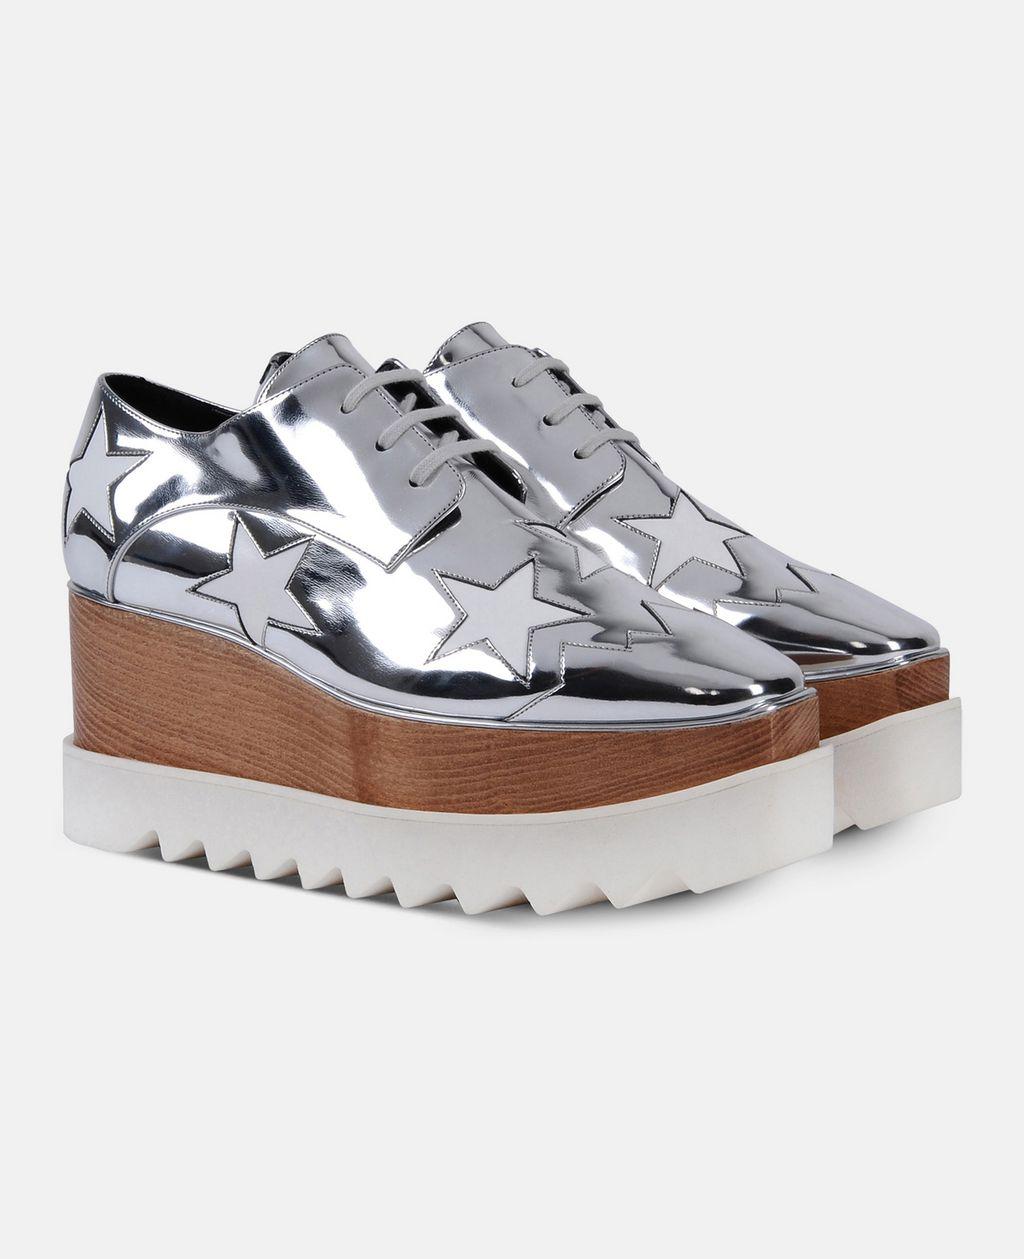 Indium Elyse Star Shoes - STELLA MCCARTNEY